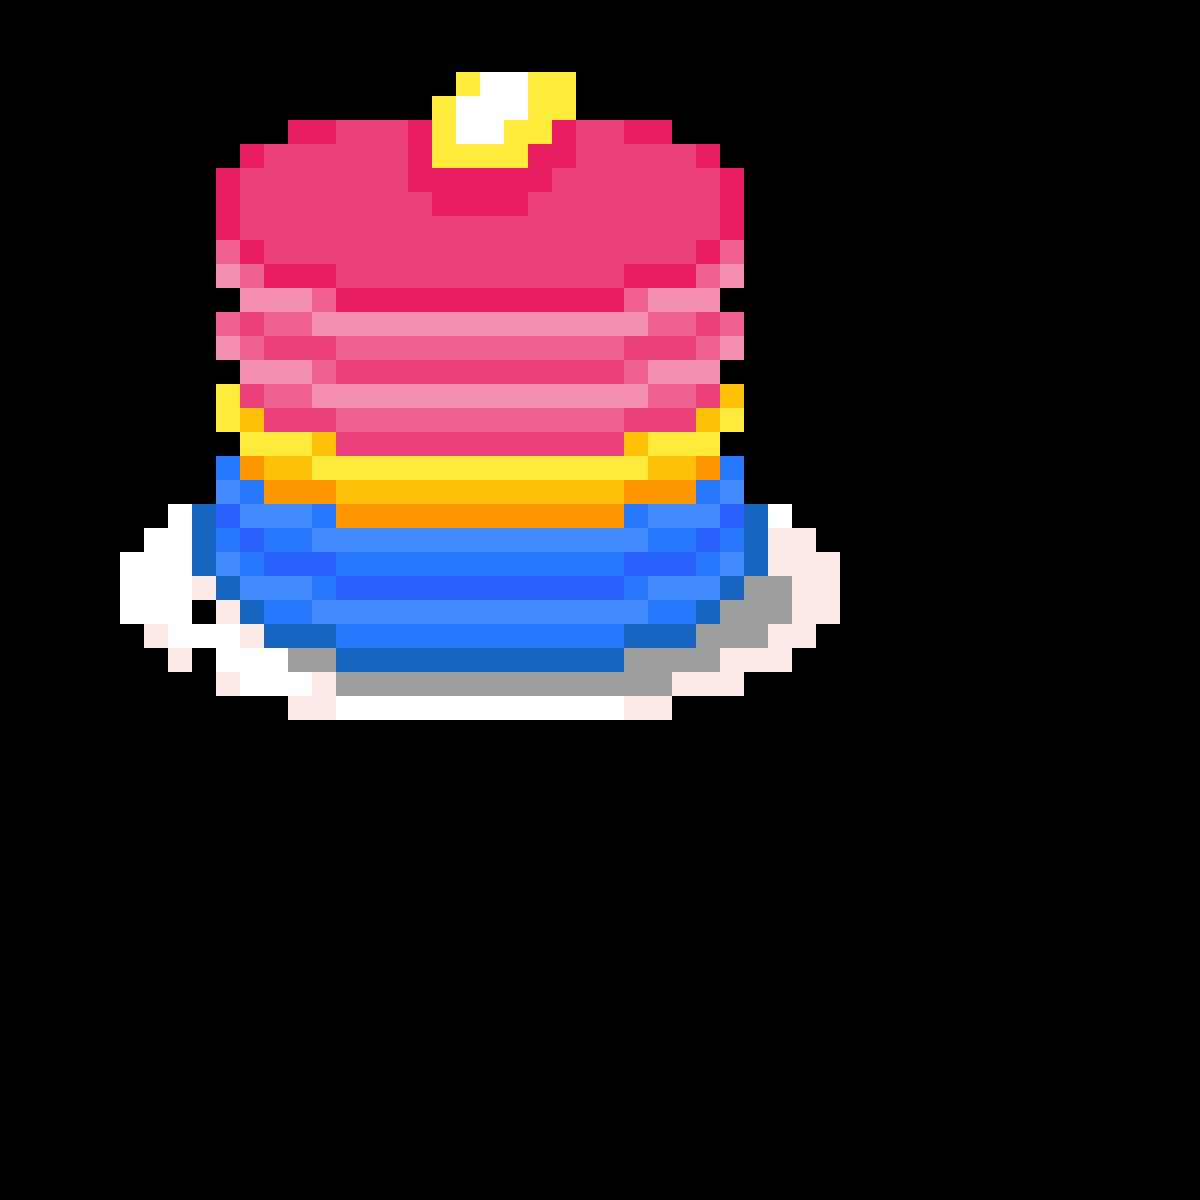 PANcake by Biboy